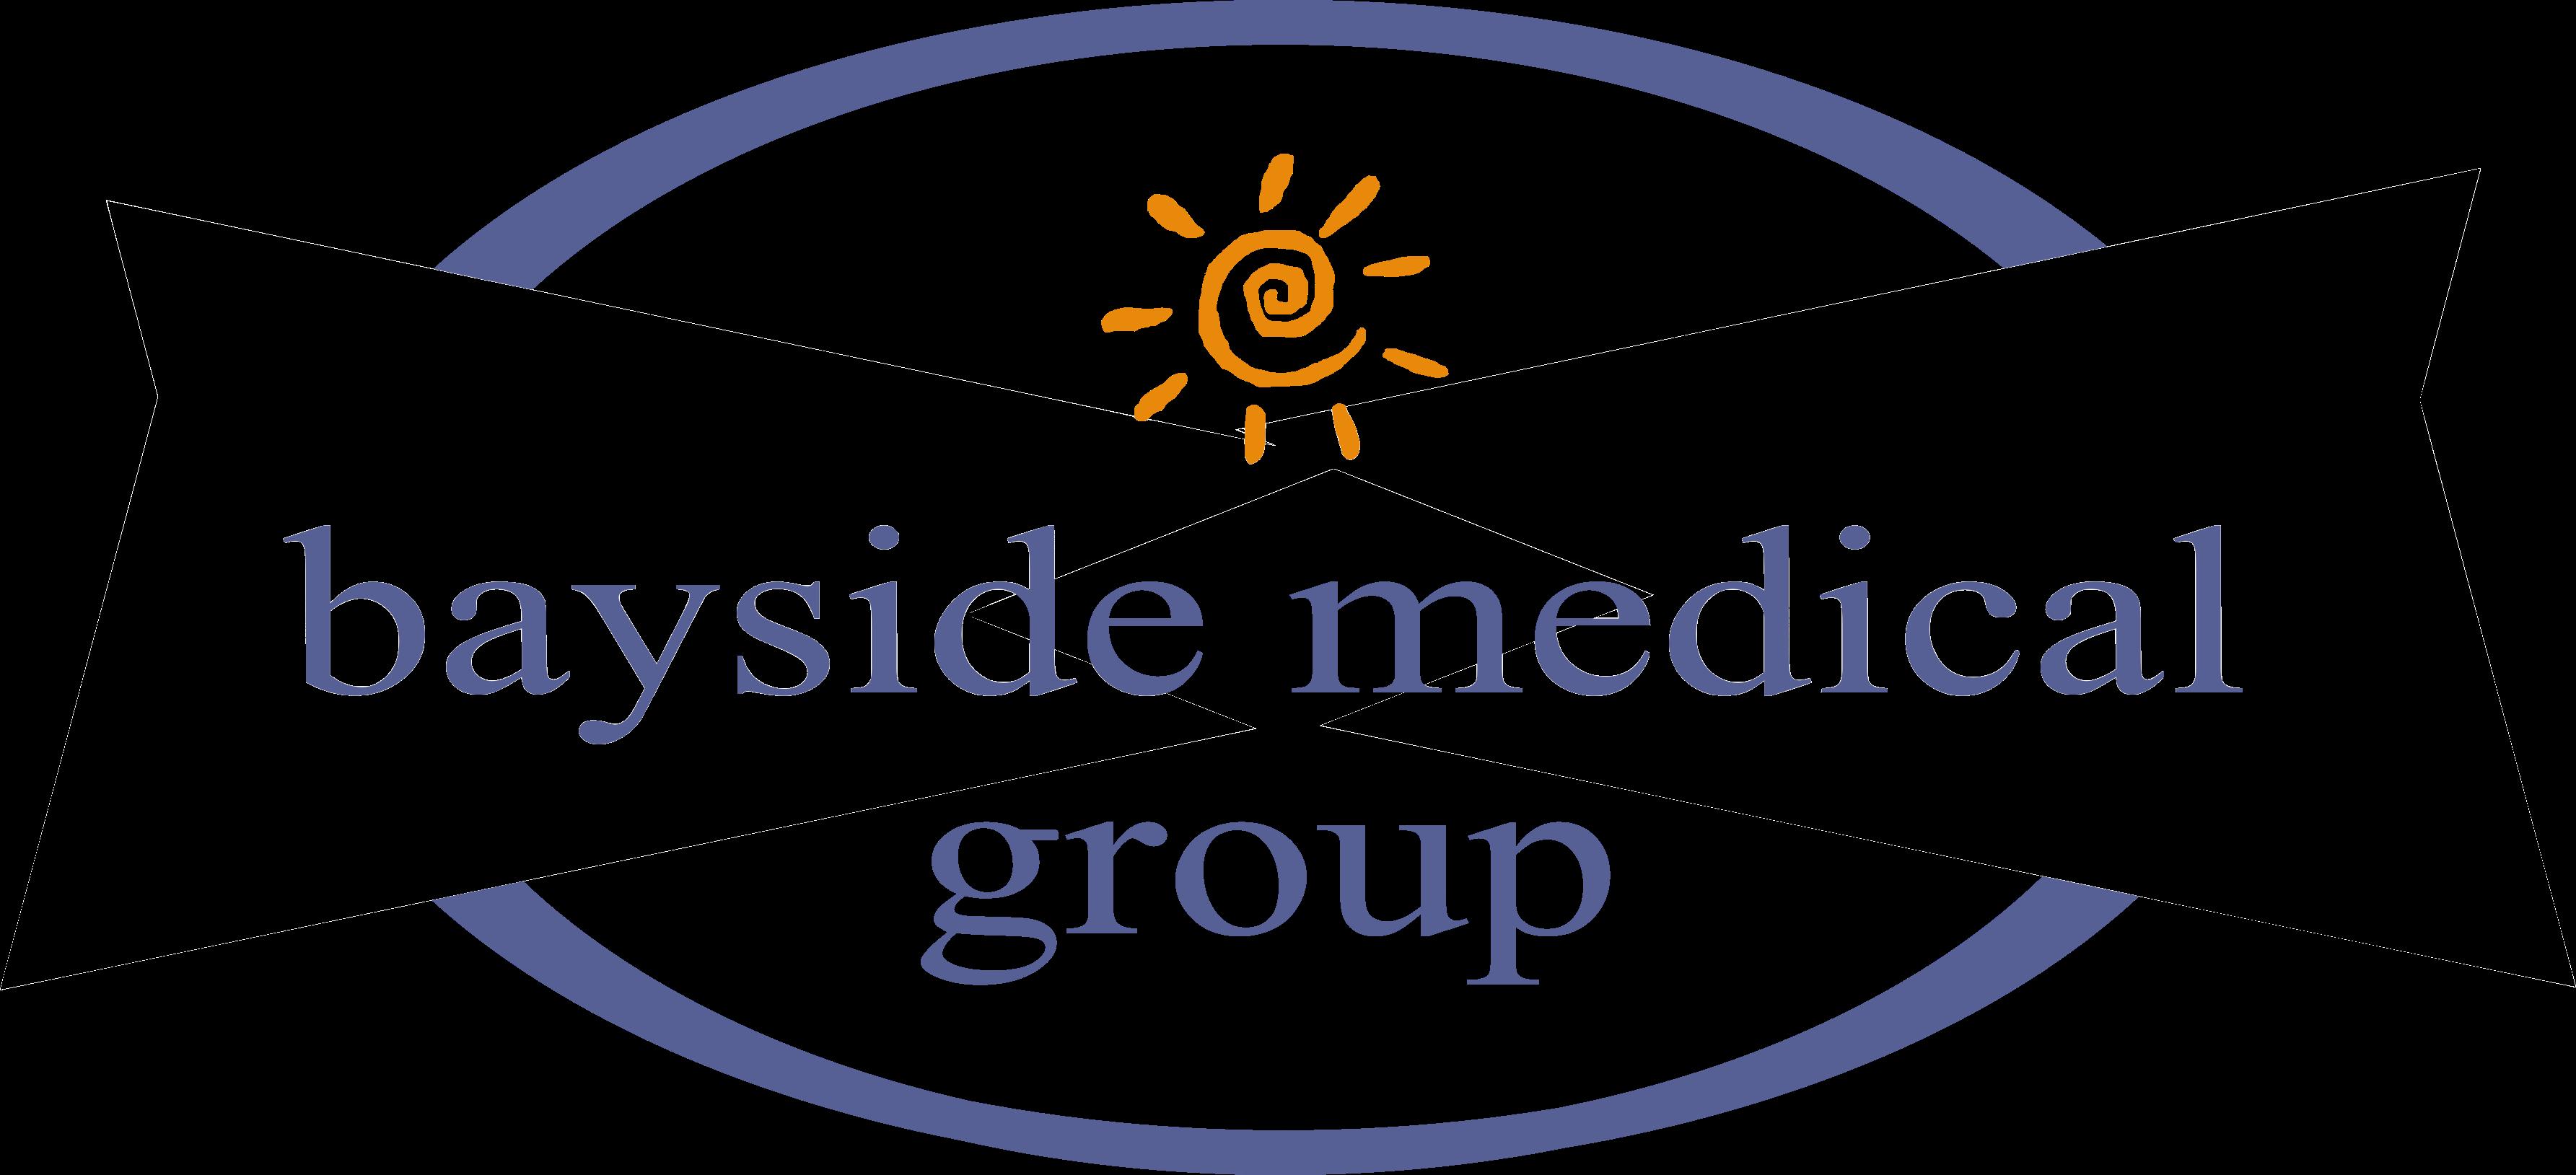 Bayside Medical Group